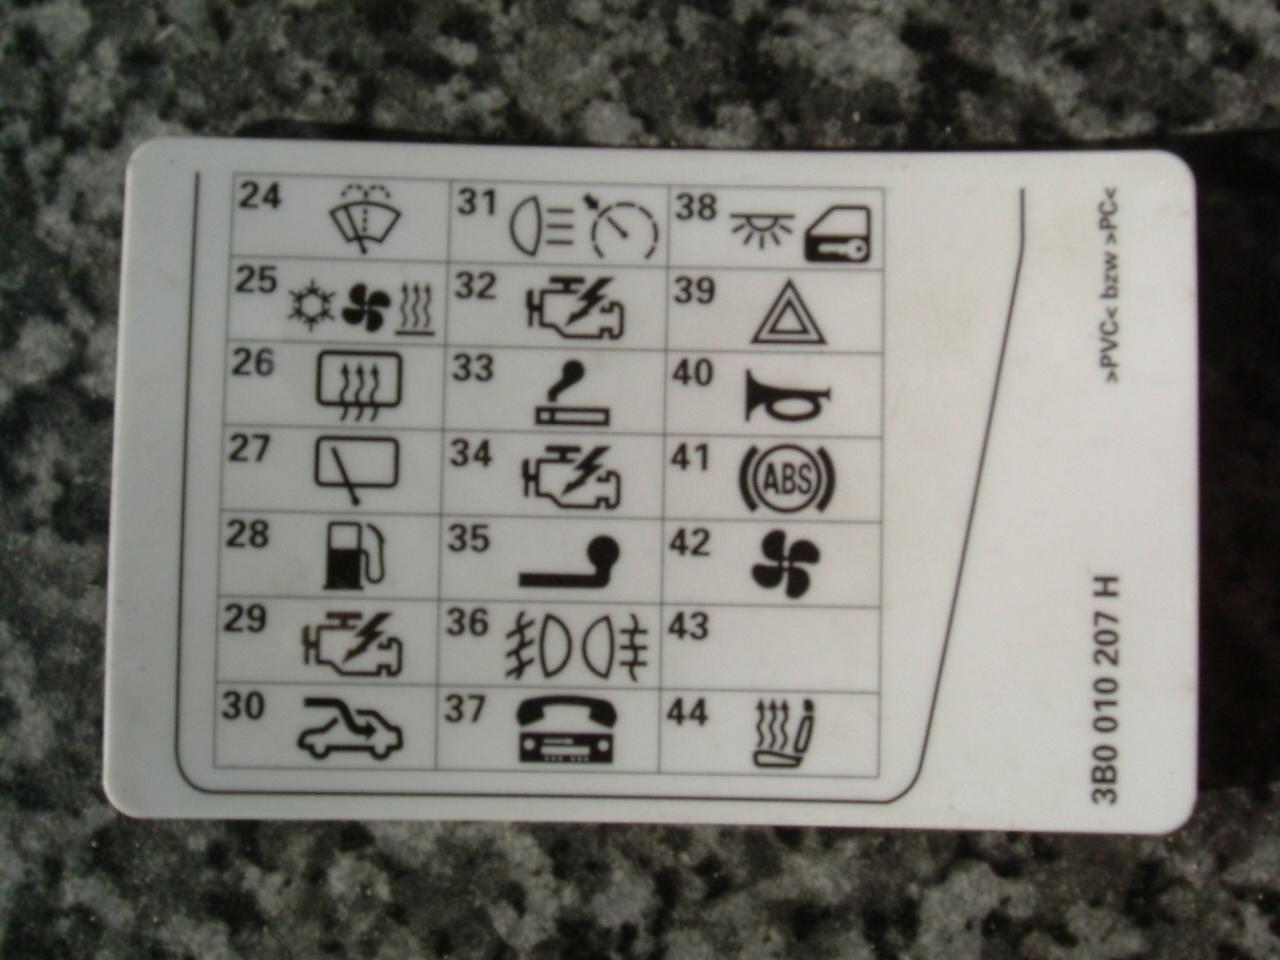 2007 Volkswagen Gti Fuse Box Diagram Osazen 237 Pojistek Fusecard Interi 233 R Elektro Vw Passat